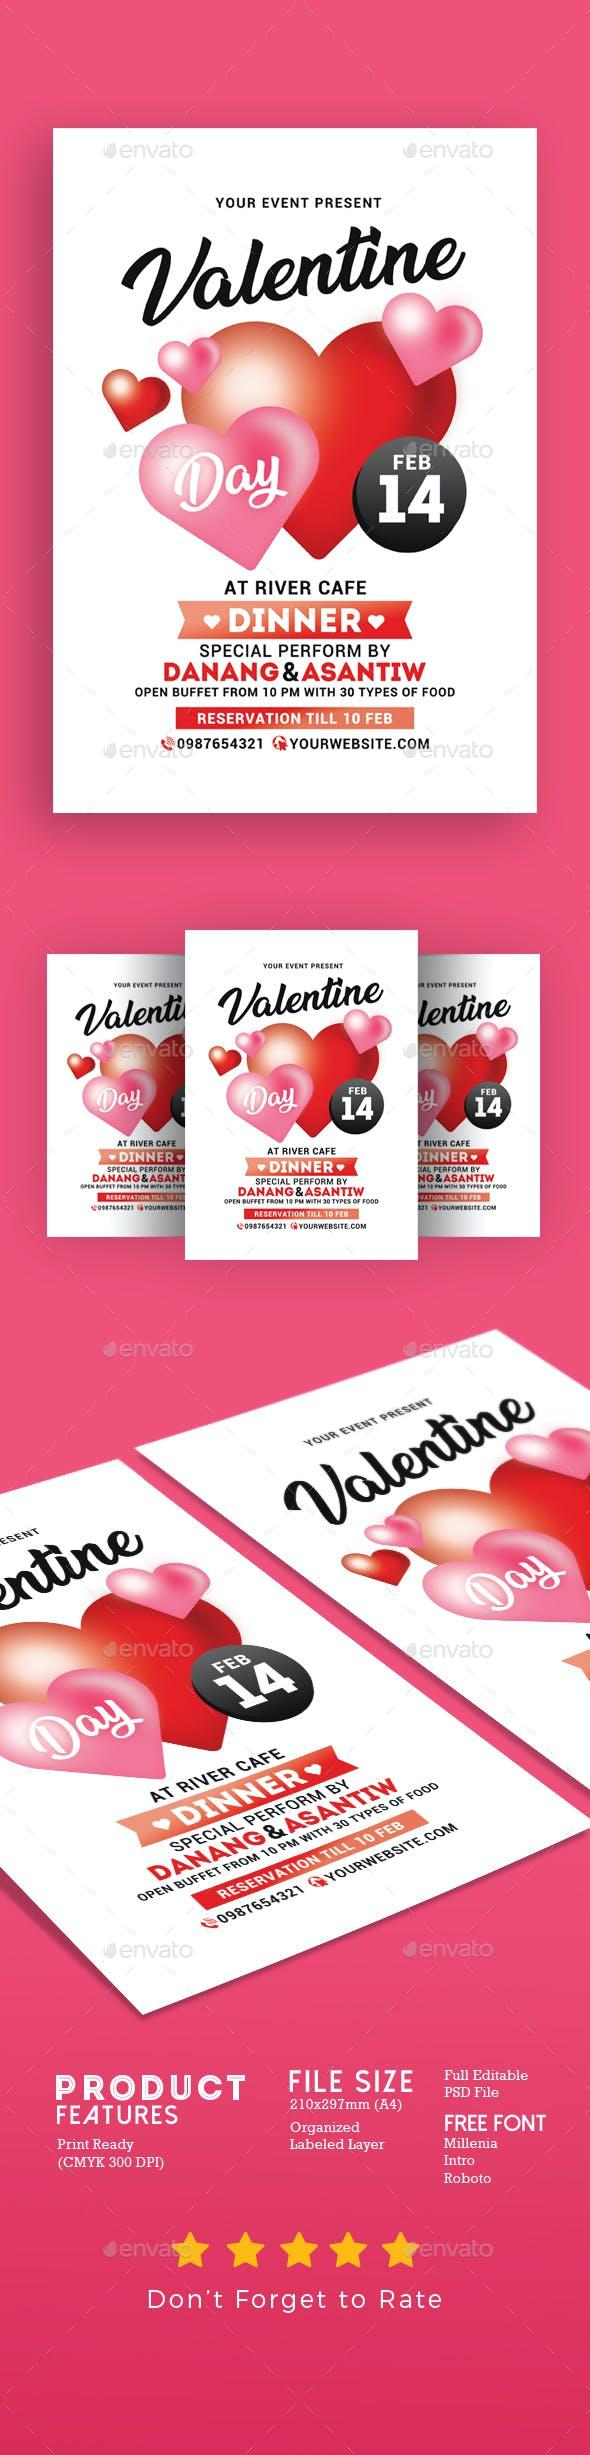 Valentine Day Dinner Flyer By Muhamadiqbalhidayat Graphicriver